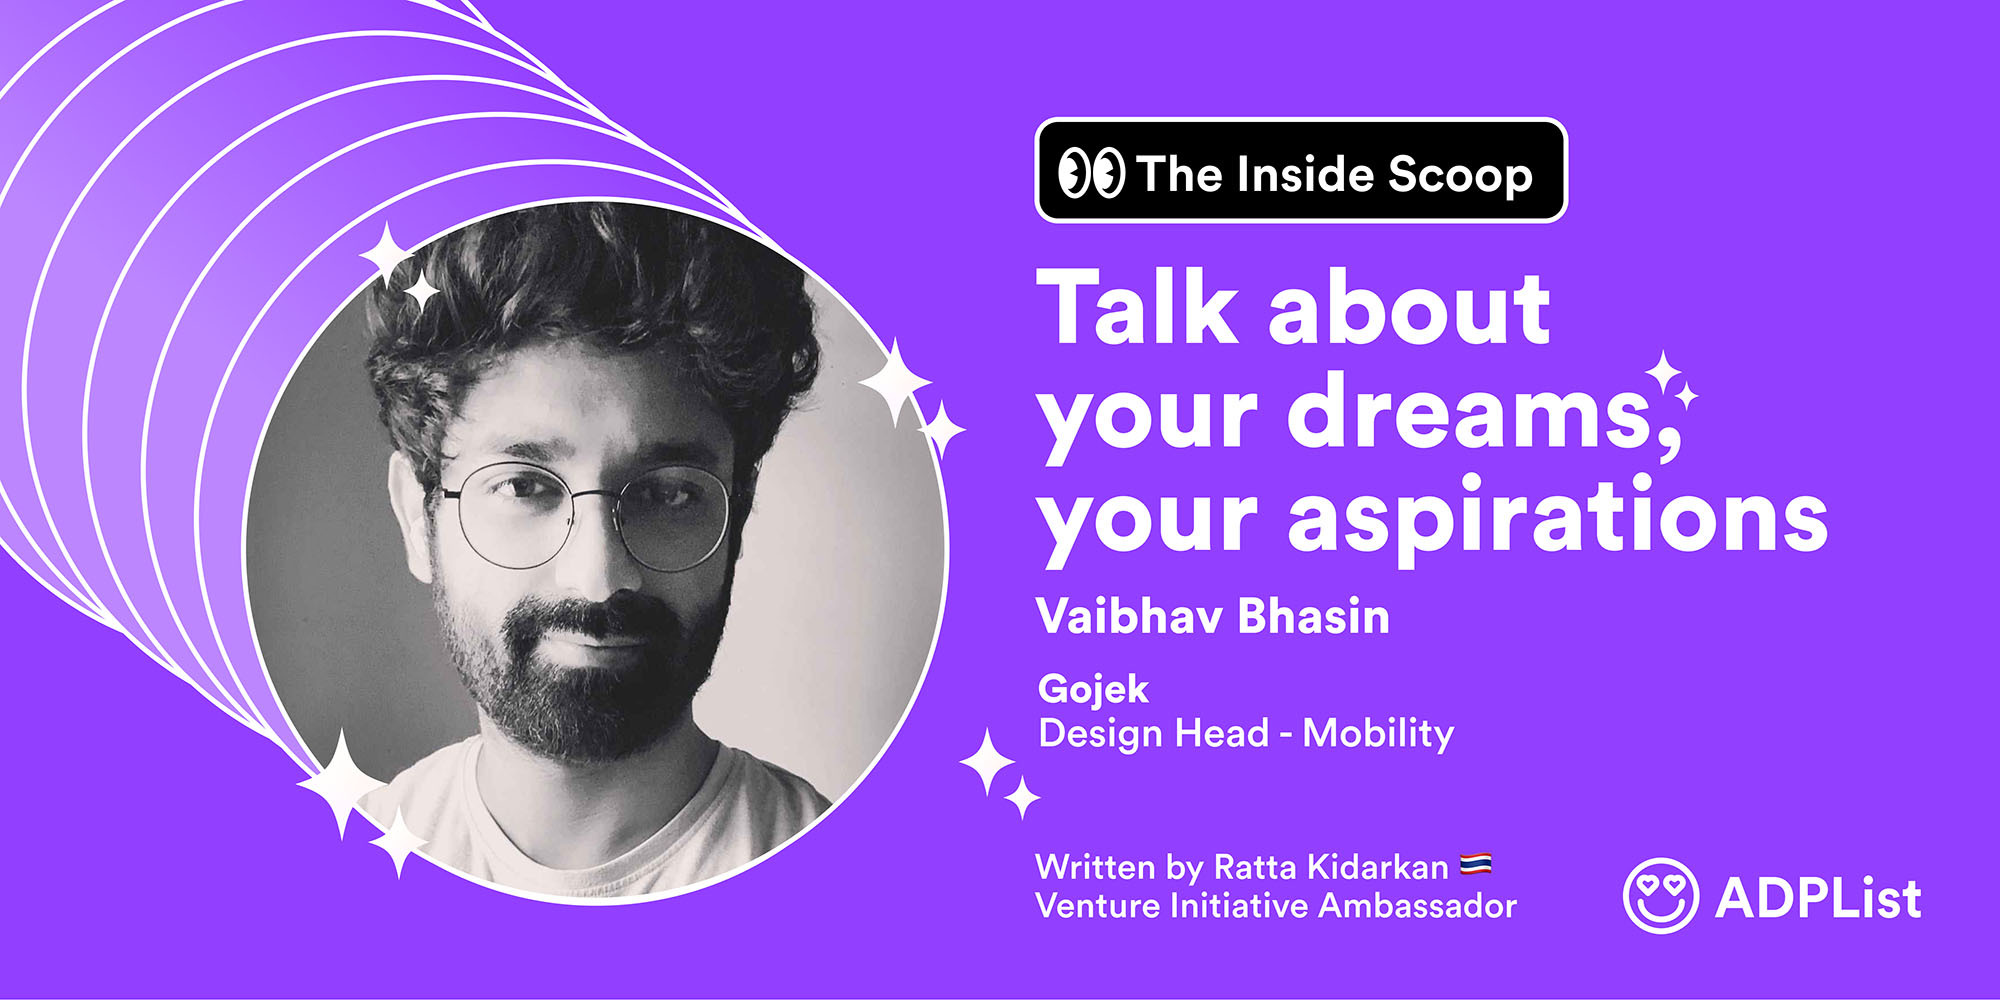 🍨 The Inside Scoop : Vaibhav Bhasin 🇮🇳